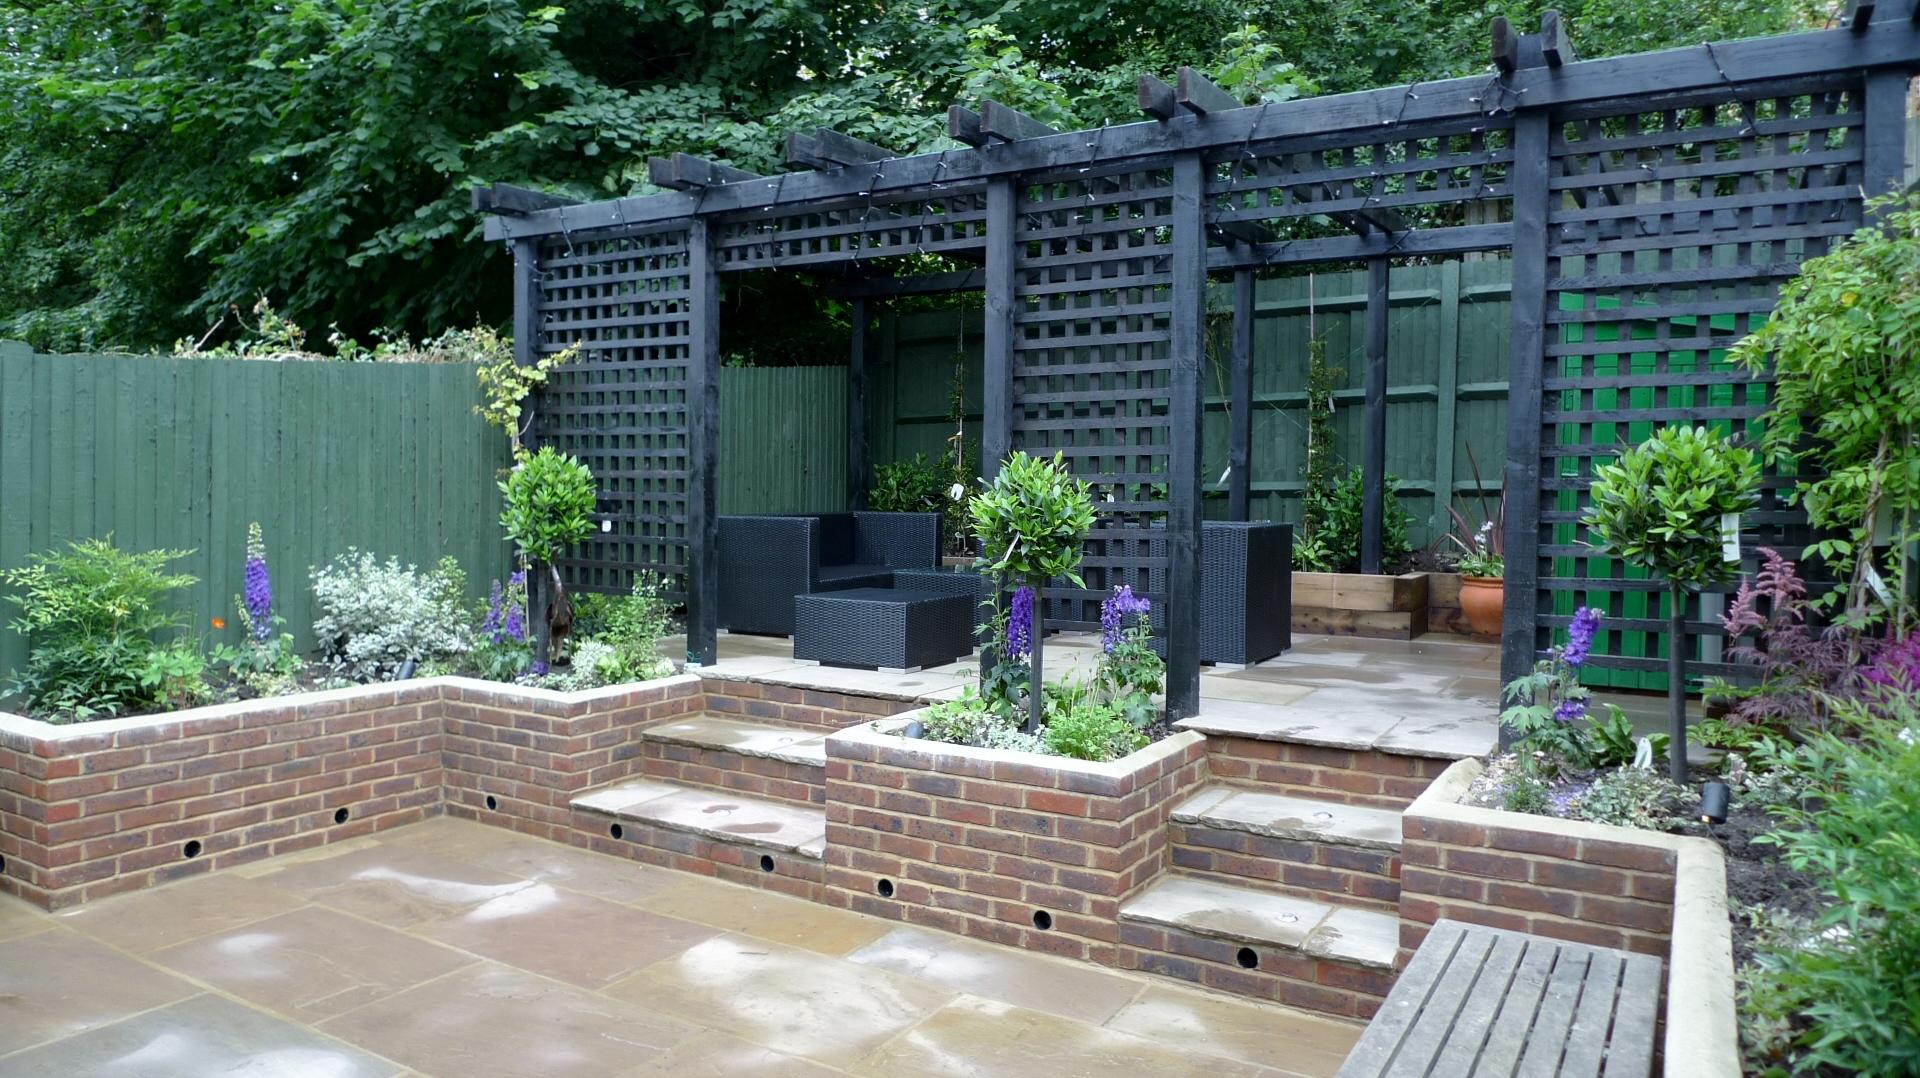 Garden walls pergola paving steps planting design designer ... on Garden Patio Wall Ideas id=58242